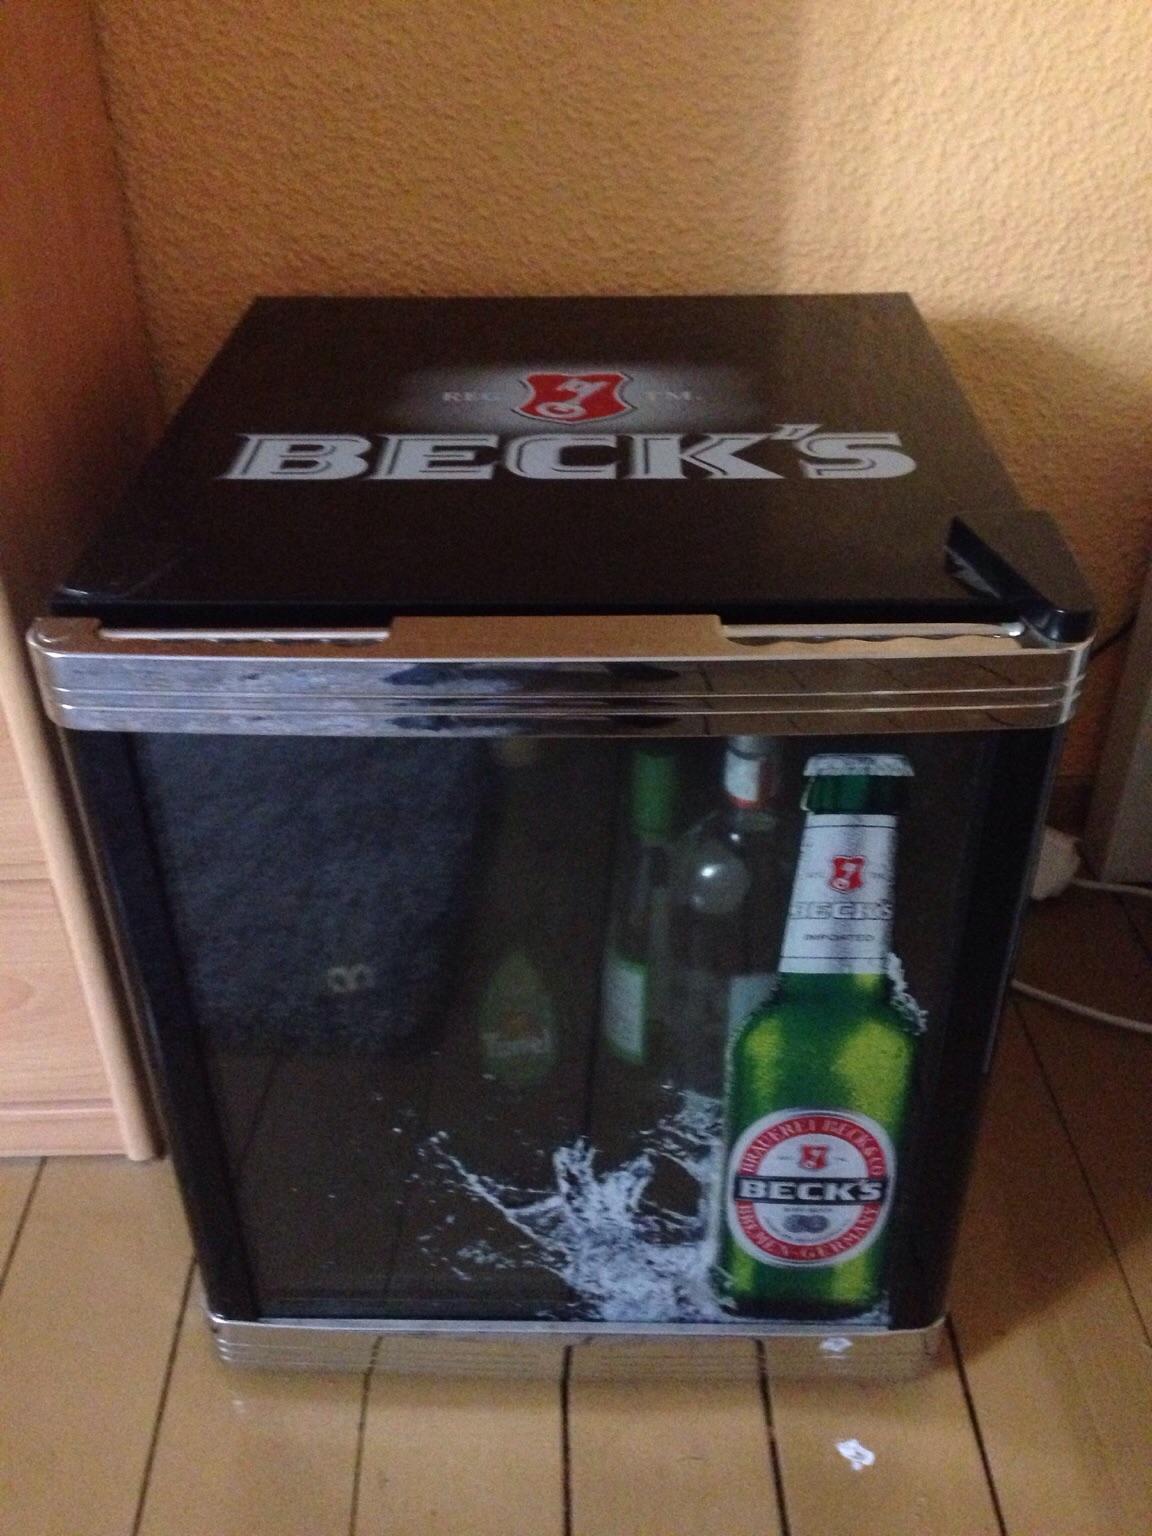 Kleiner Kühlschrank Becks : Gebraucht becks kühlschrank in dortmund um u ac u shpock